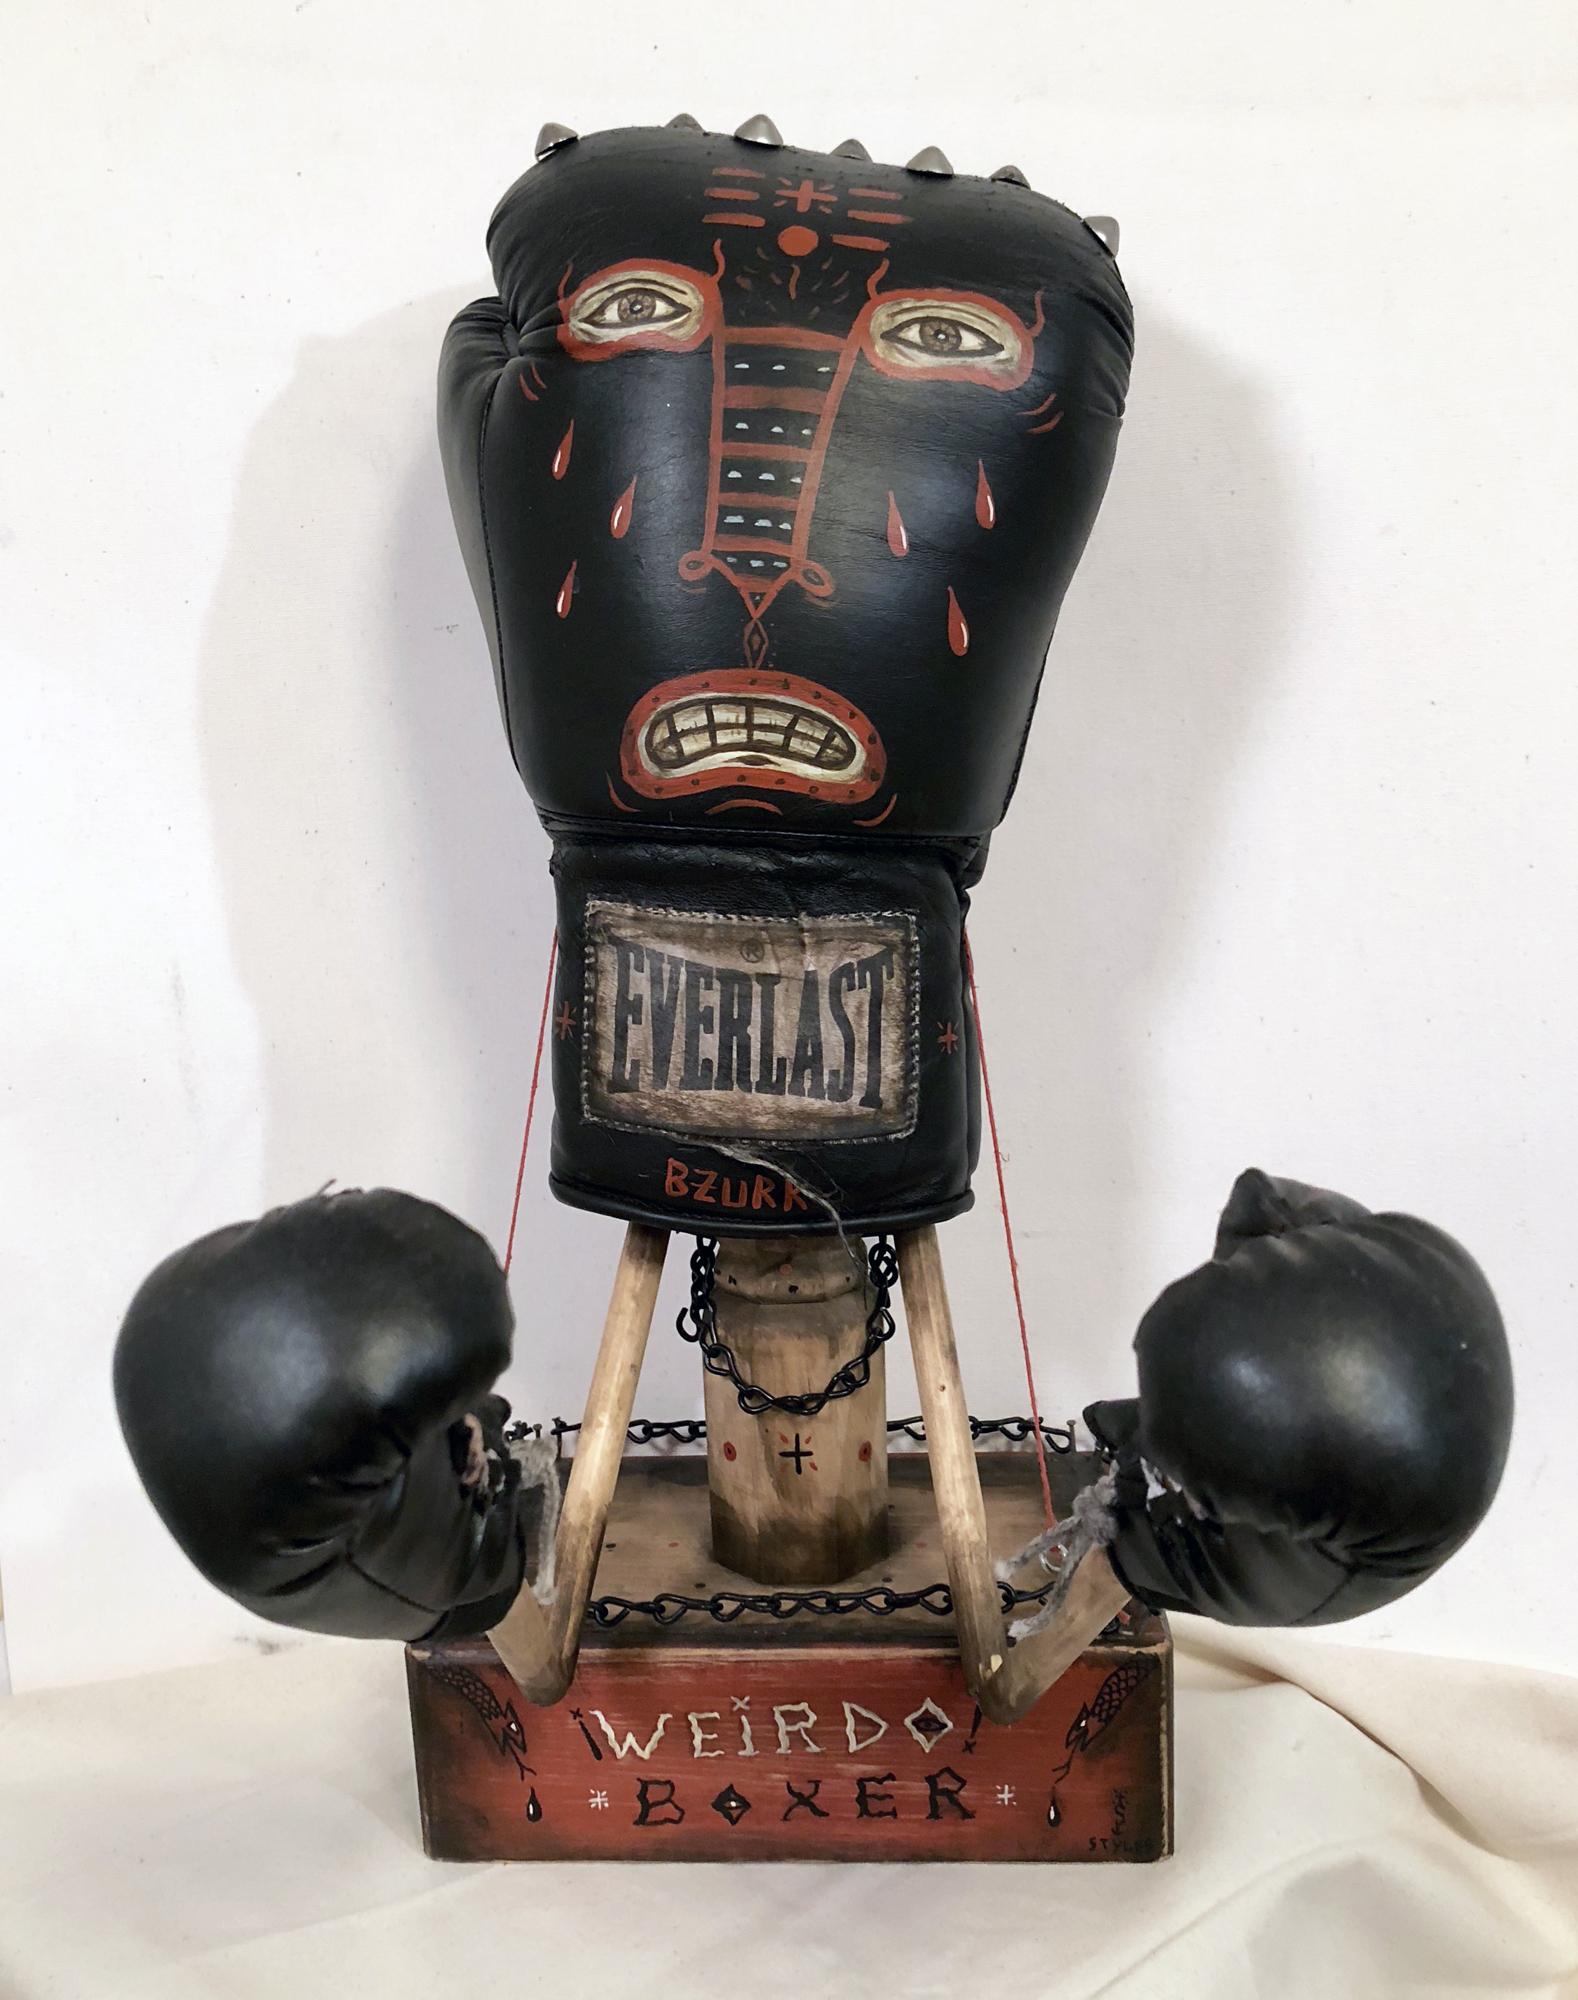 Weirdo Boxer,  Acrylic on boxing glove, marionette arms, 19 x 15 x 9, $850